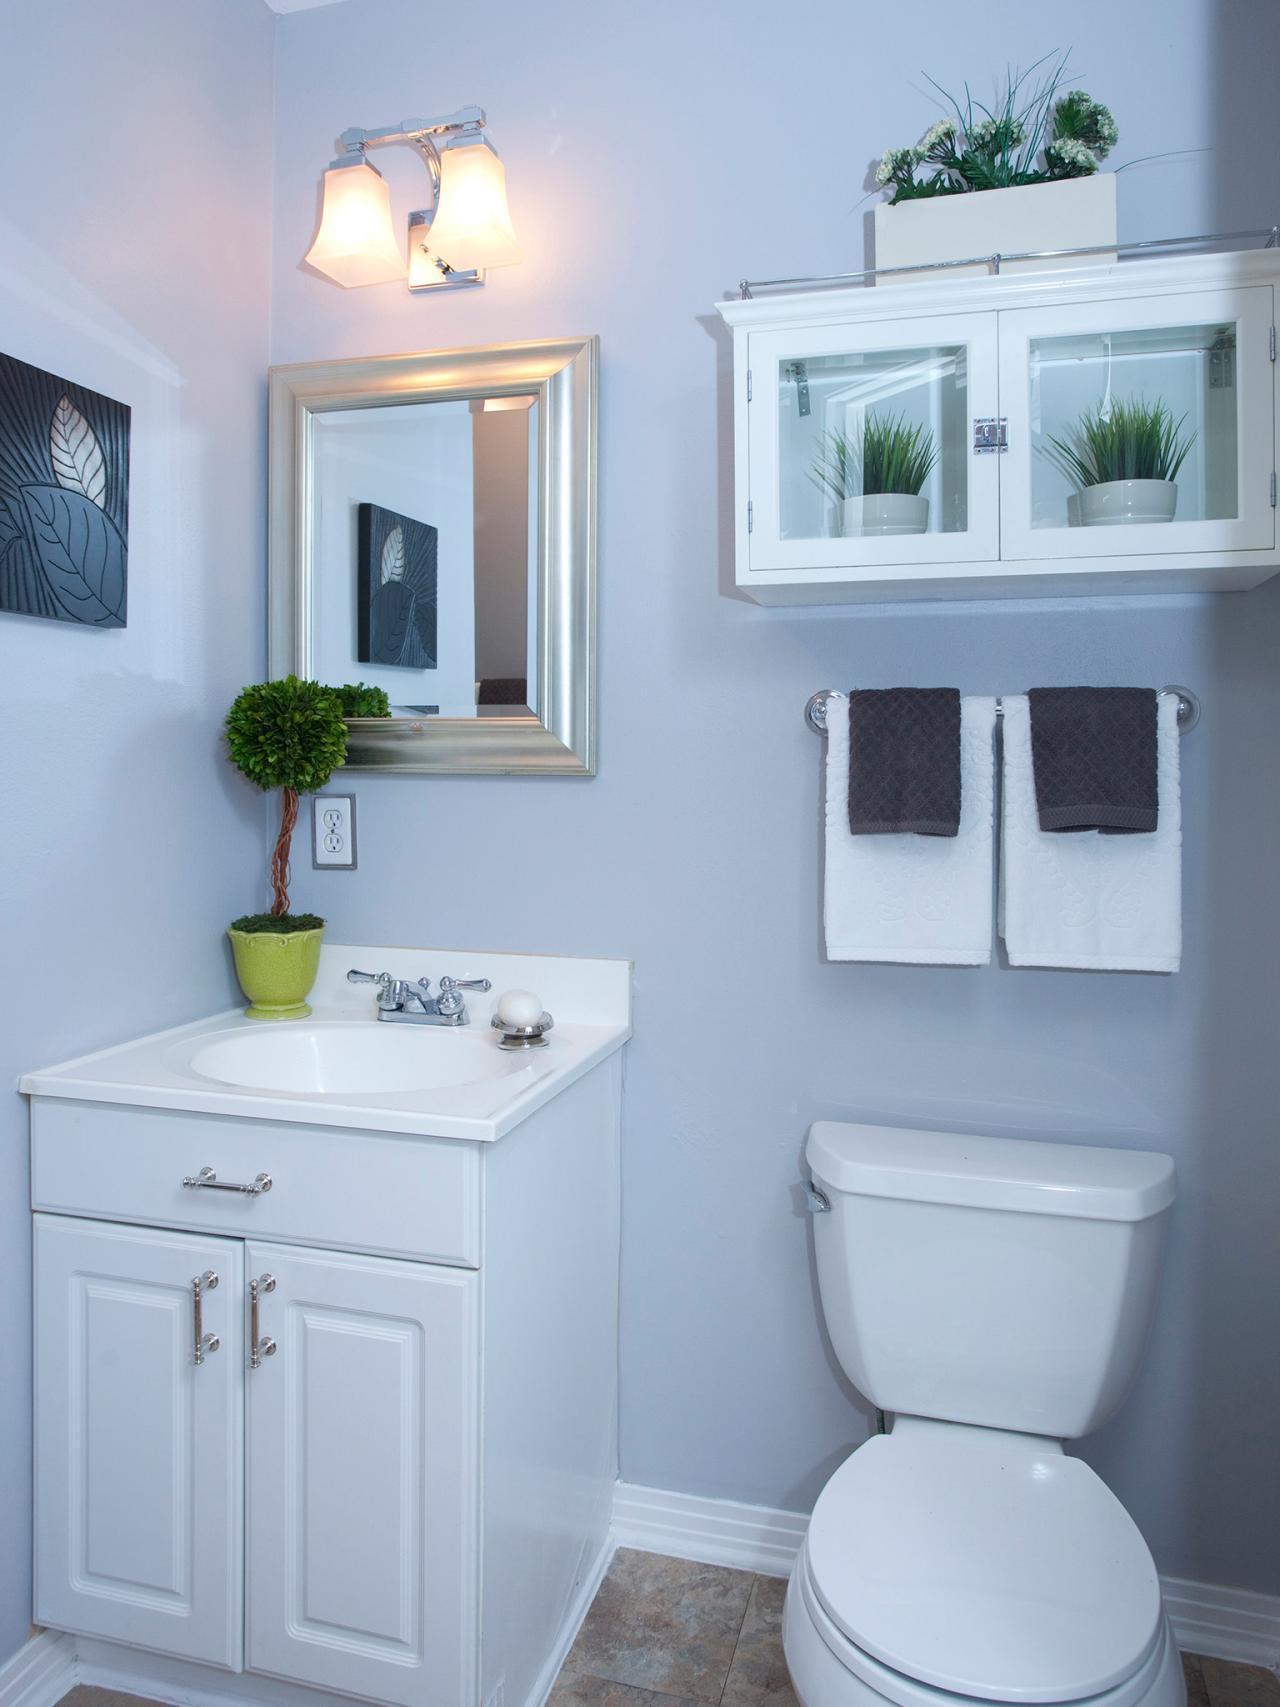 Magnificent Remodeling Bathrooms Ideas Image - Bathroom - knawi.com